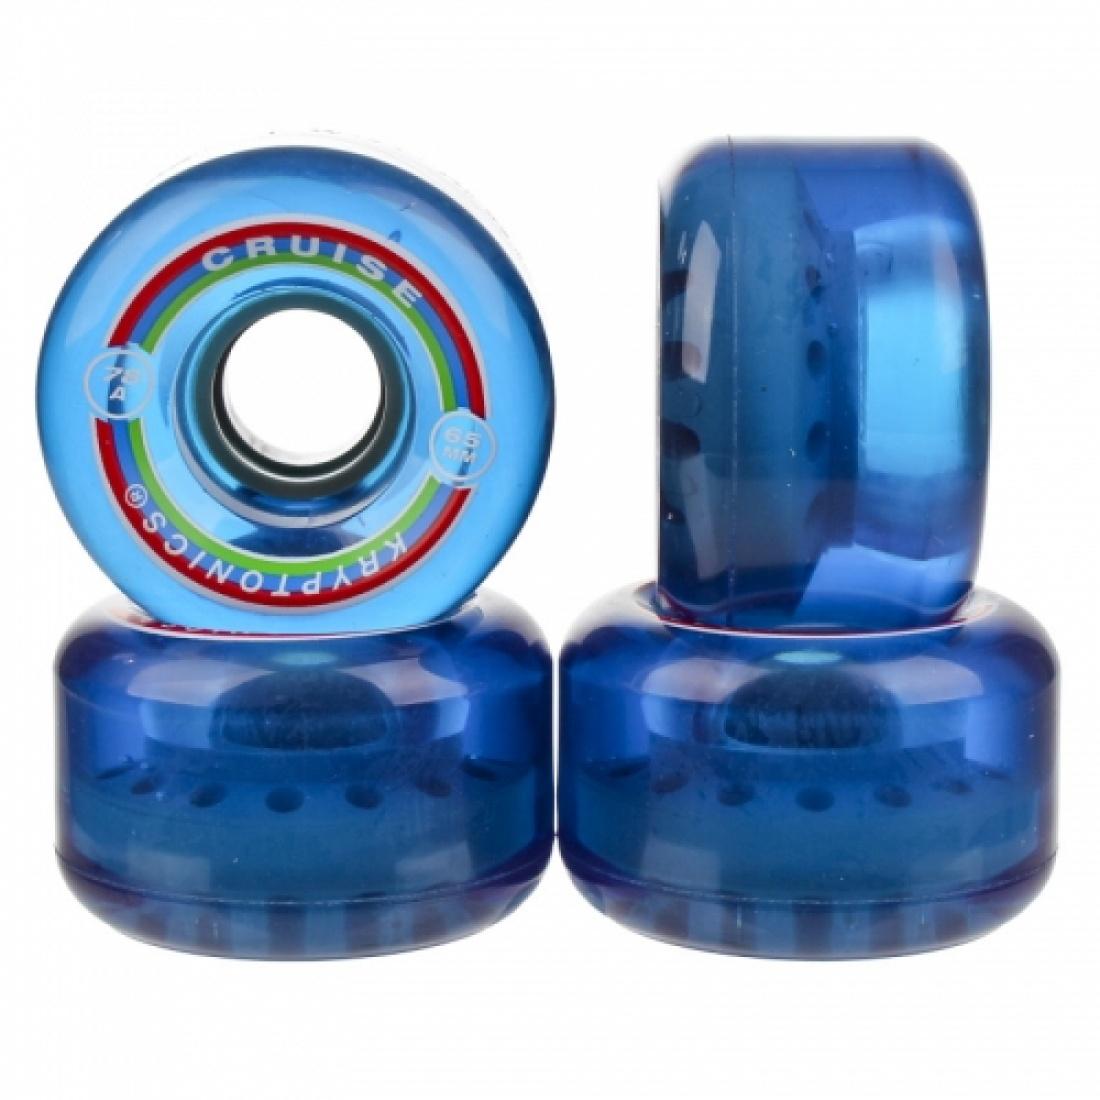 KRY-Cruise Wheels Blue 65mm